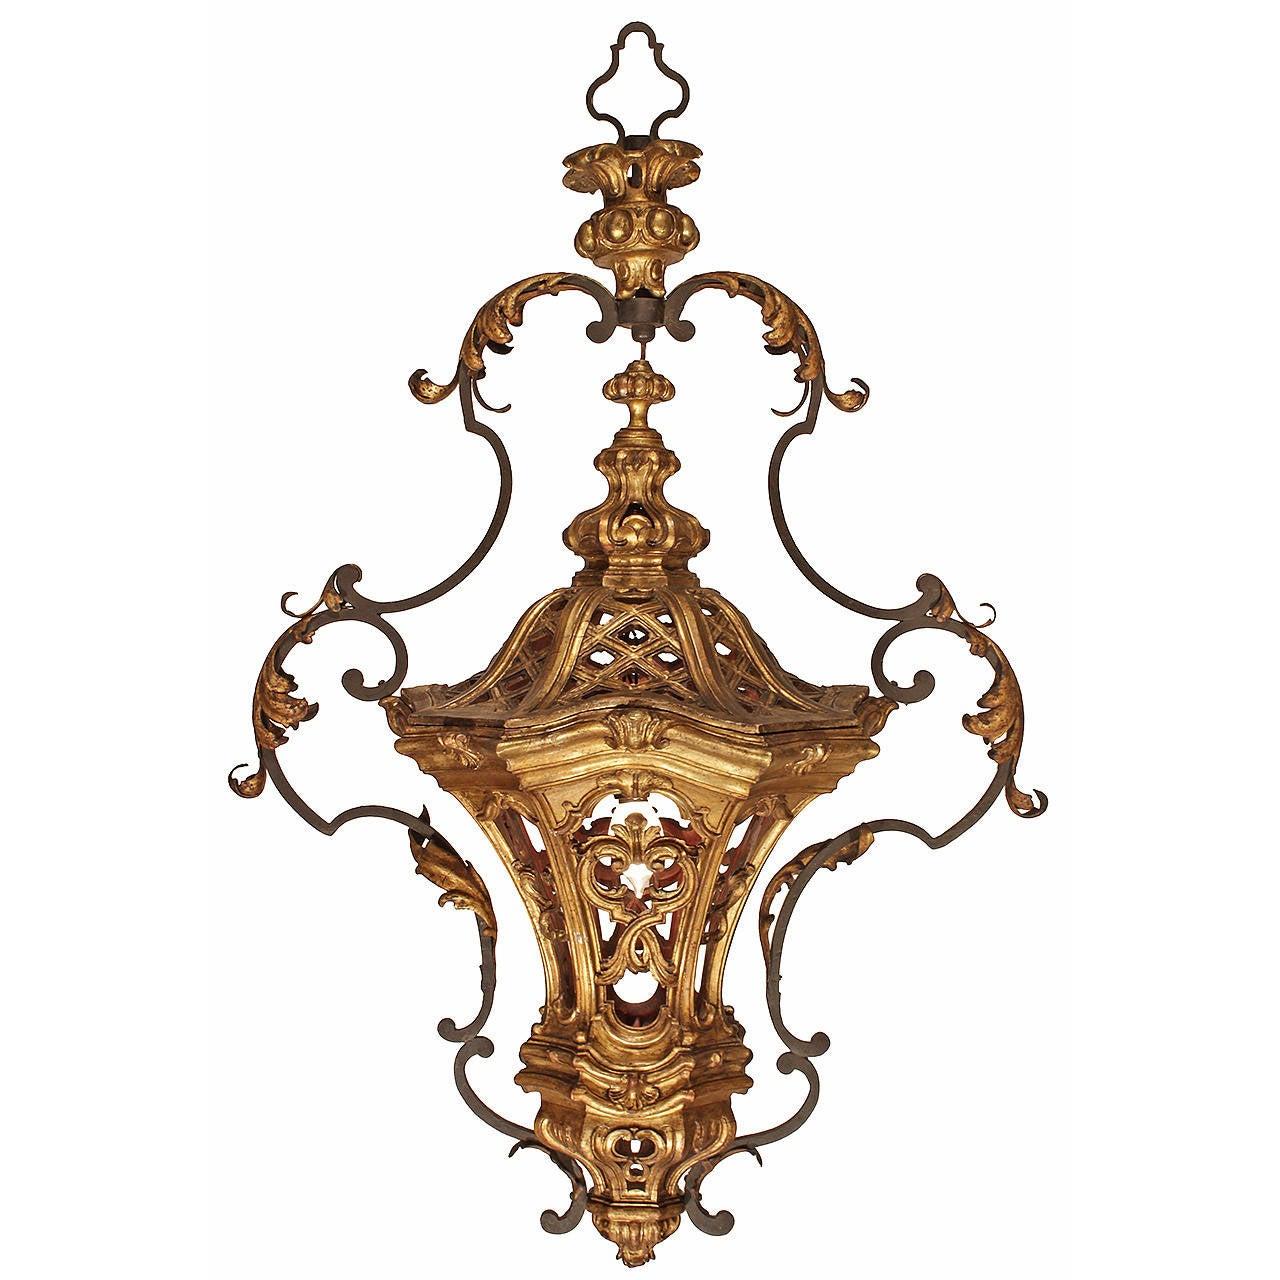 Italian 18th Century Venetian Giltwood and Gilt Metal Lantern Chandelier